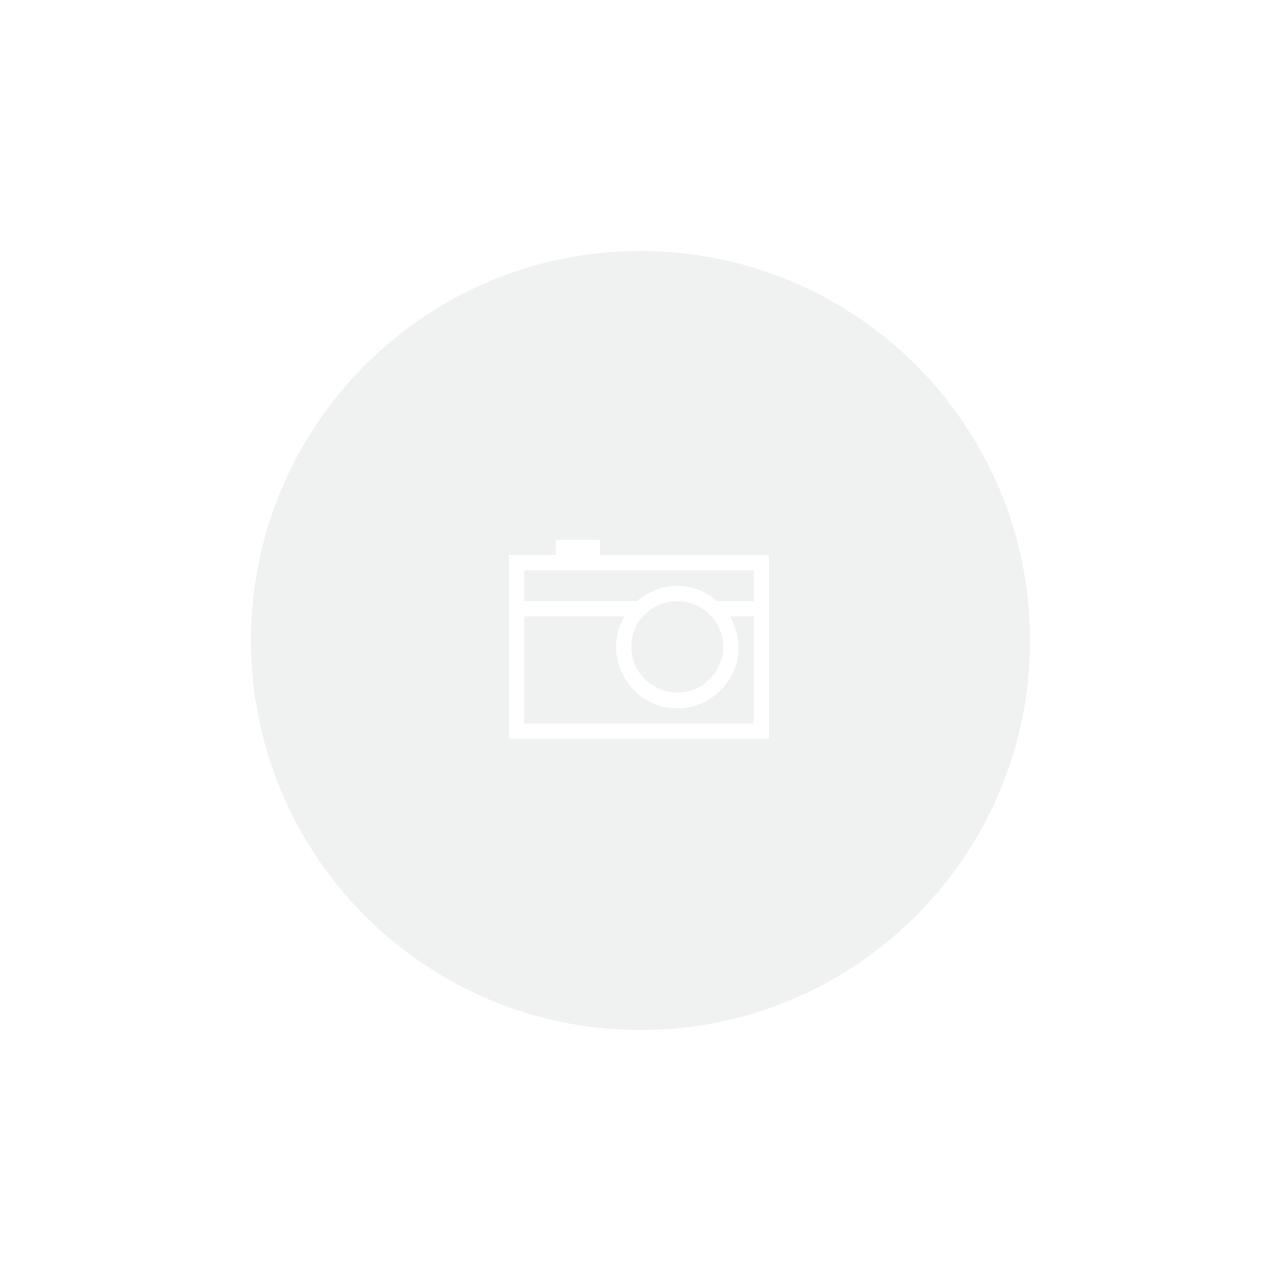 VISTA LIGHT CATEYE TL-LD700-F RAPID X DIAN. RECARREGÁVEL USB